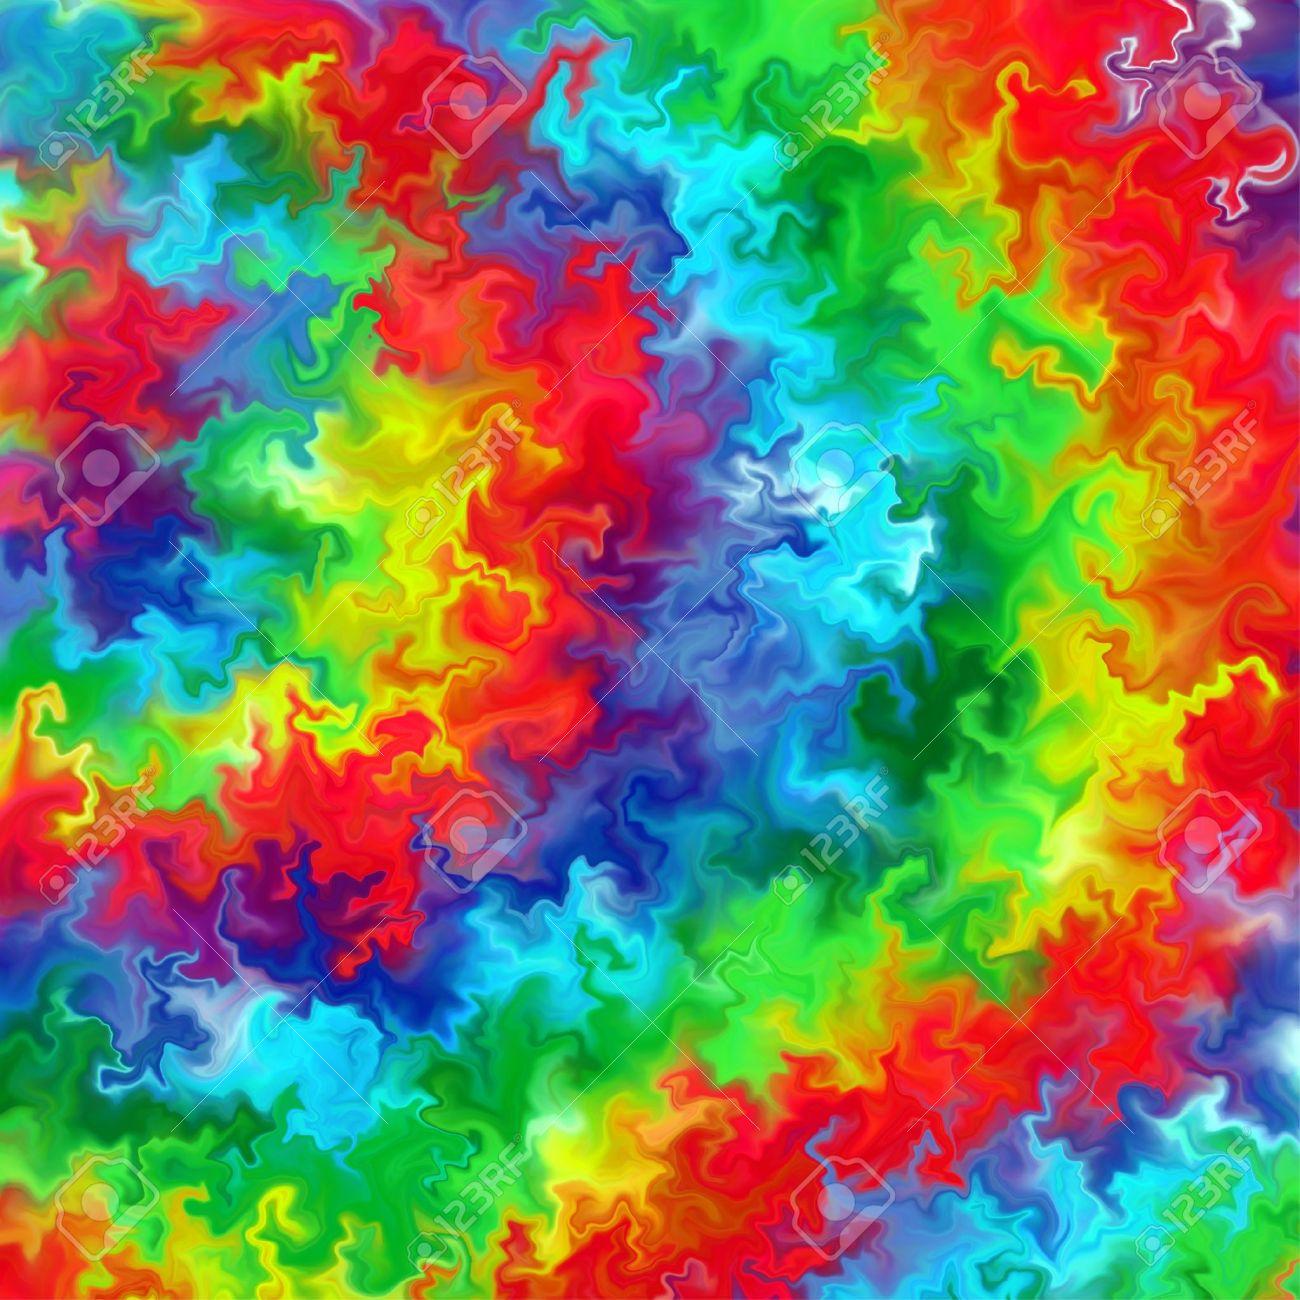 Abstract Rainbow Color Paint Splash Art Background